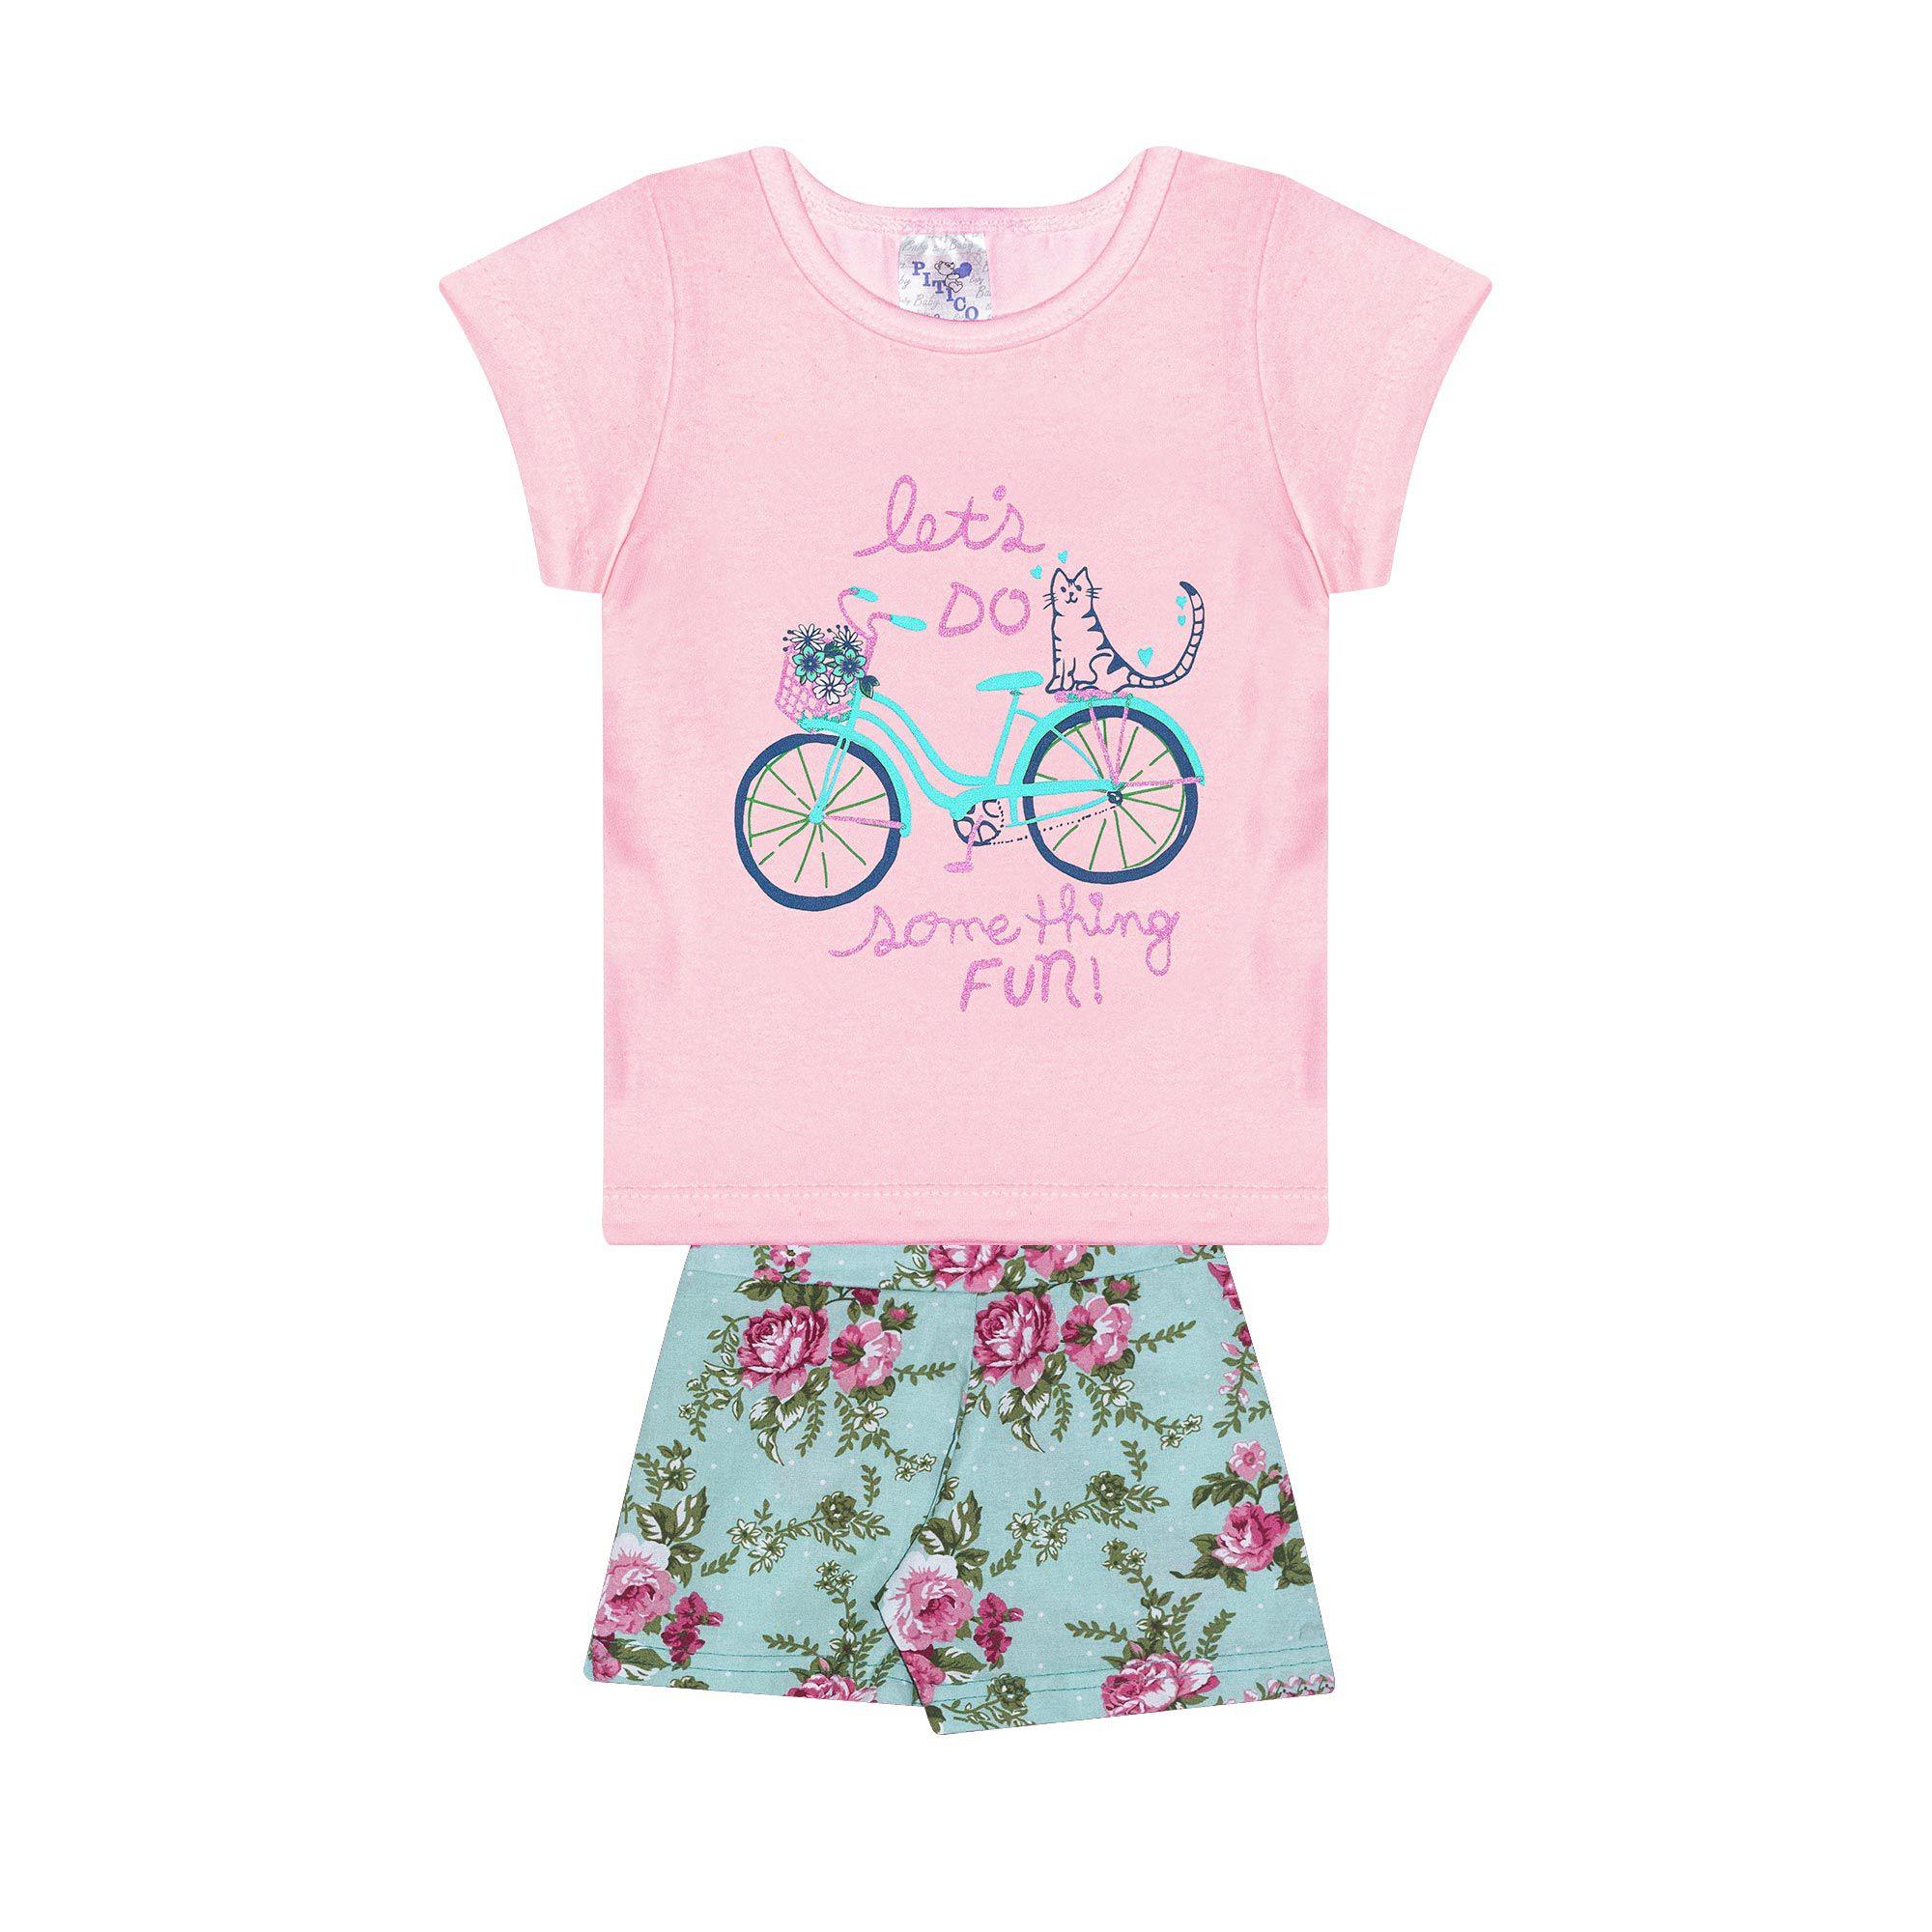 Conjunto Infantil Feminino - Ref 1013 - Rosa/Verde - Pitico